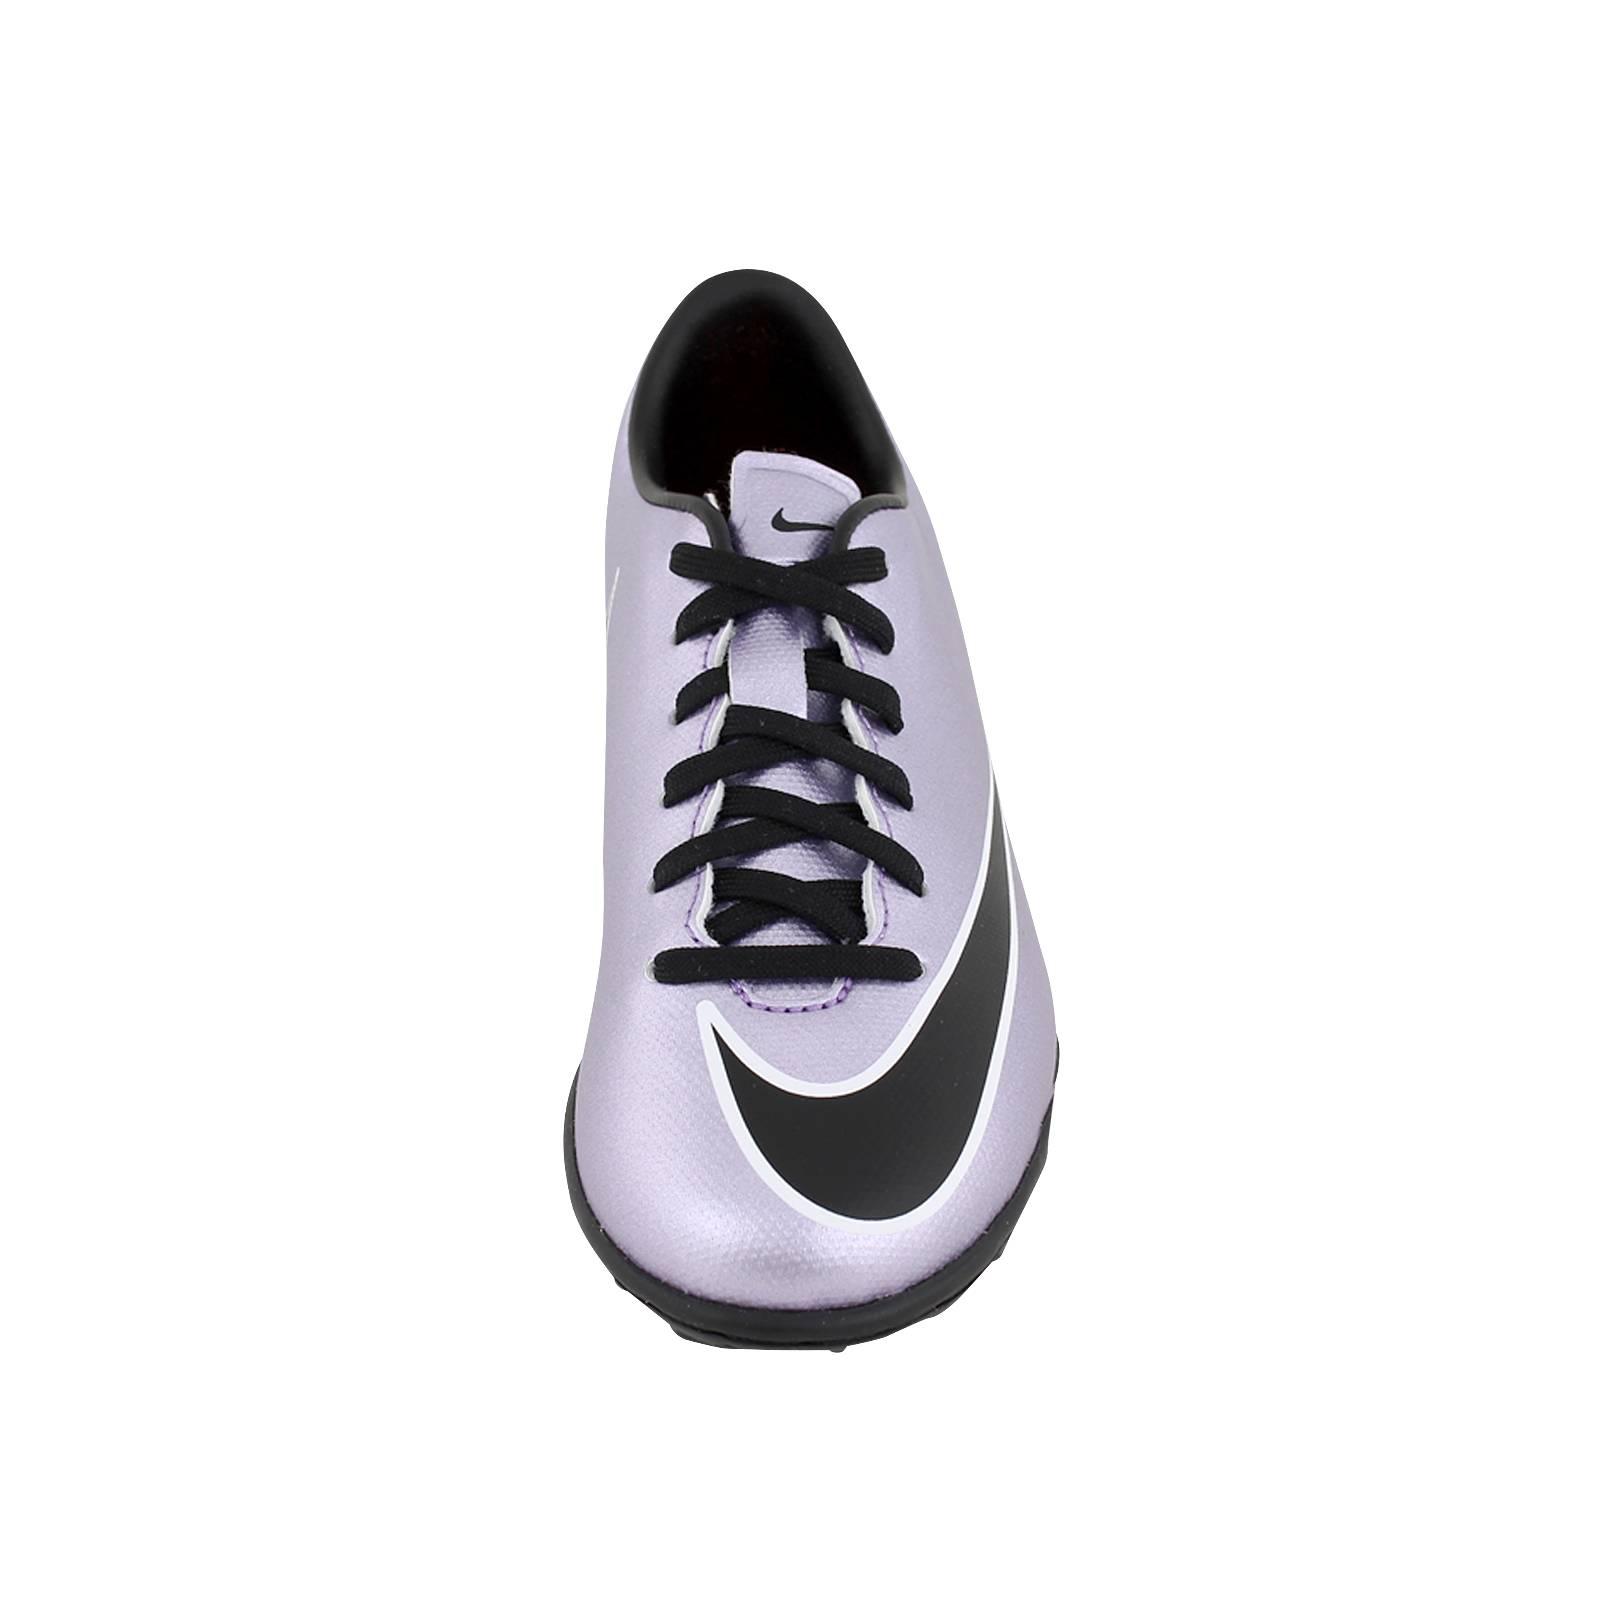 JR Mercurial V TF - Παιδικά αθλητικά παπούτσια Nike από δερμα ... a3b96b7d7f9